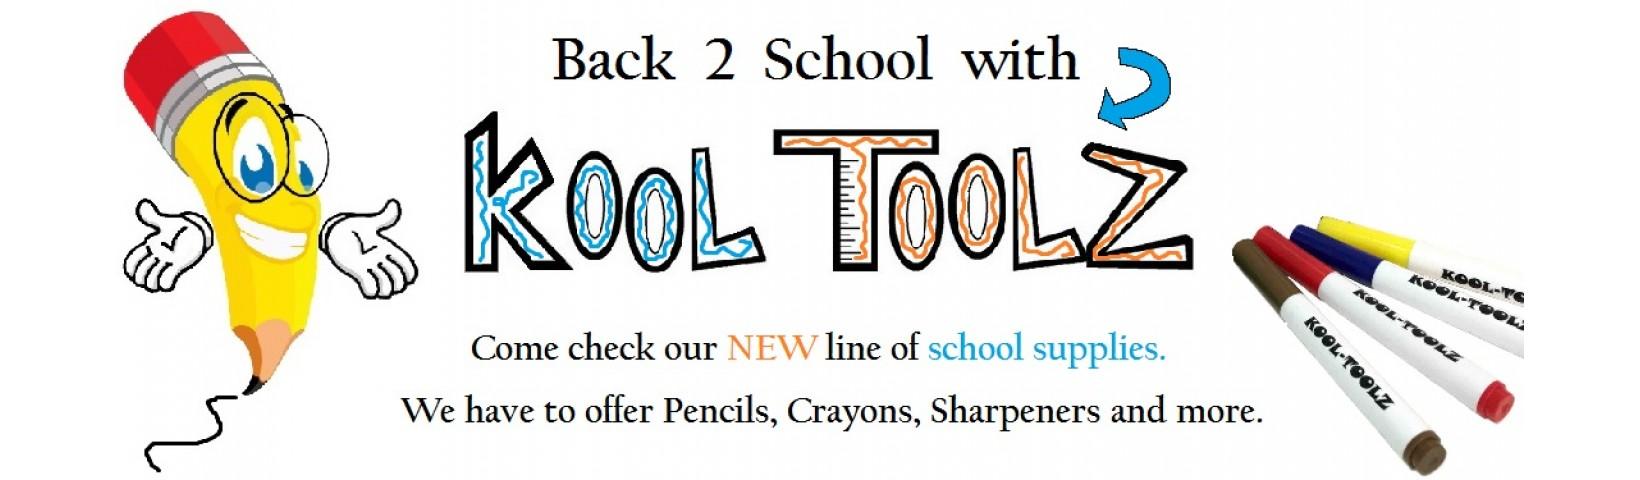 2019 kool toolz